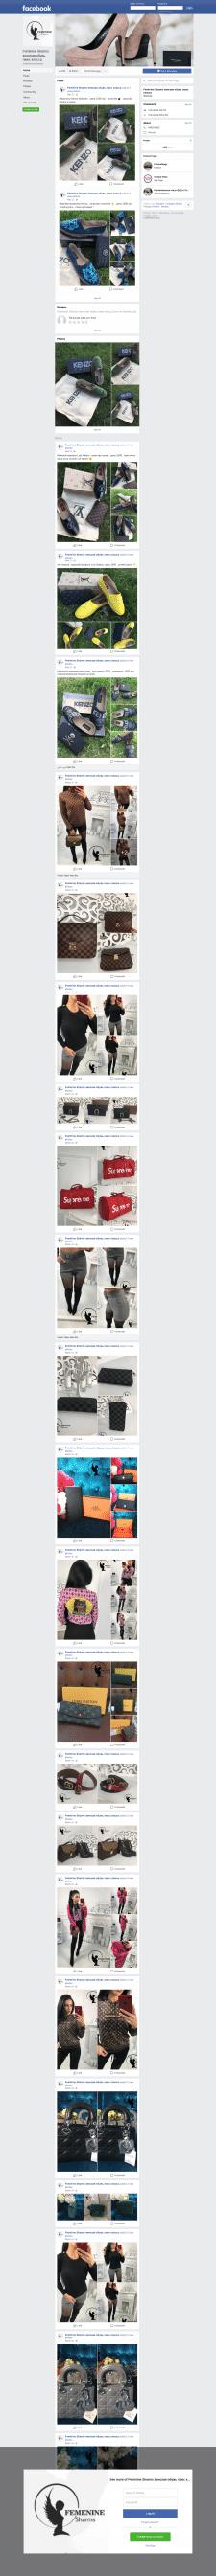 Реплики обуви (Facebook)